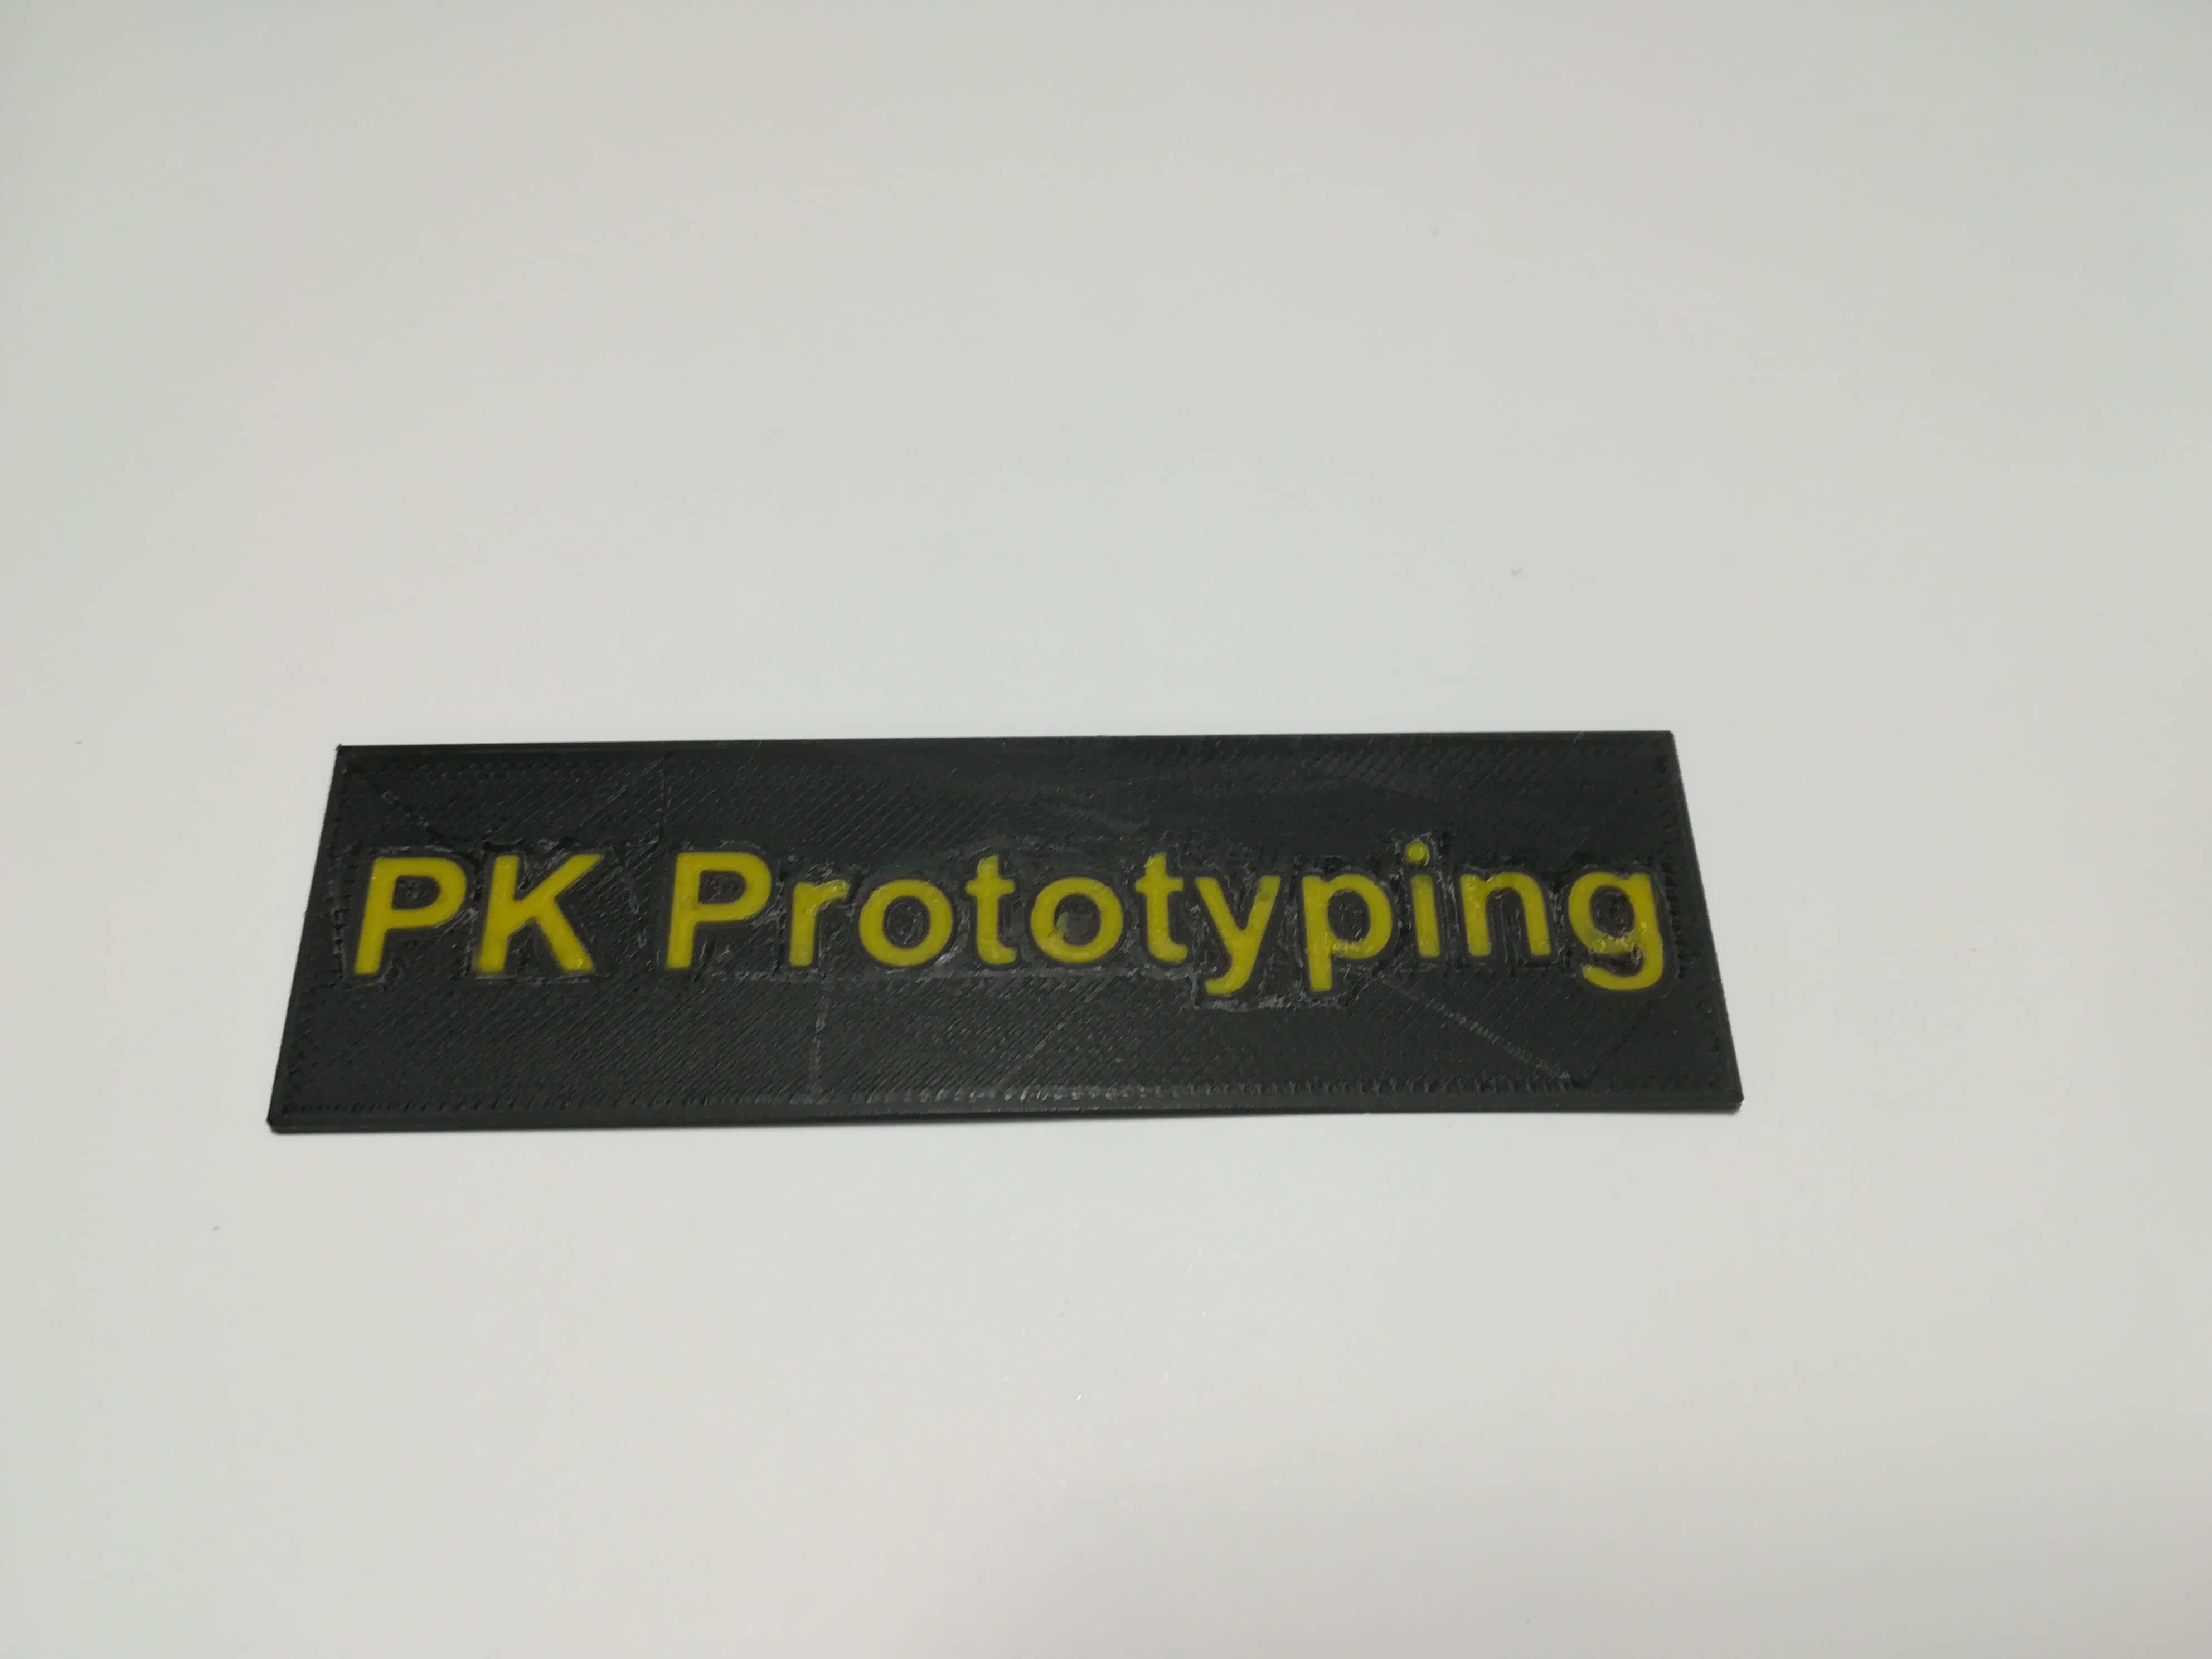 3D Druck Schrift aus 2 Farben